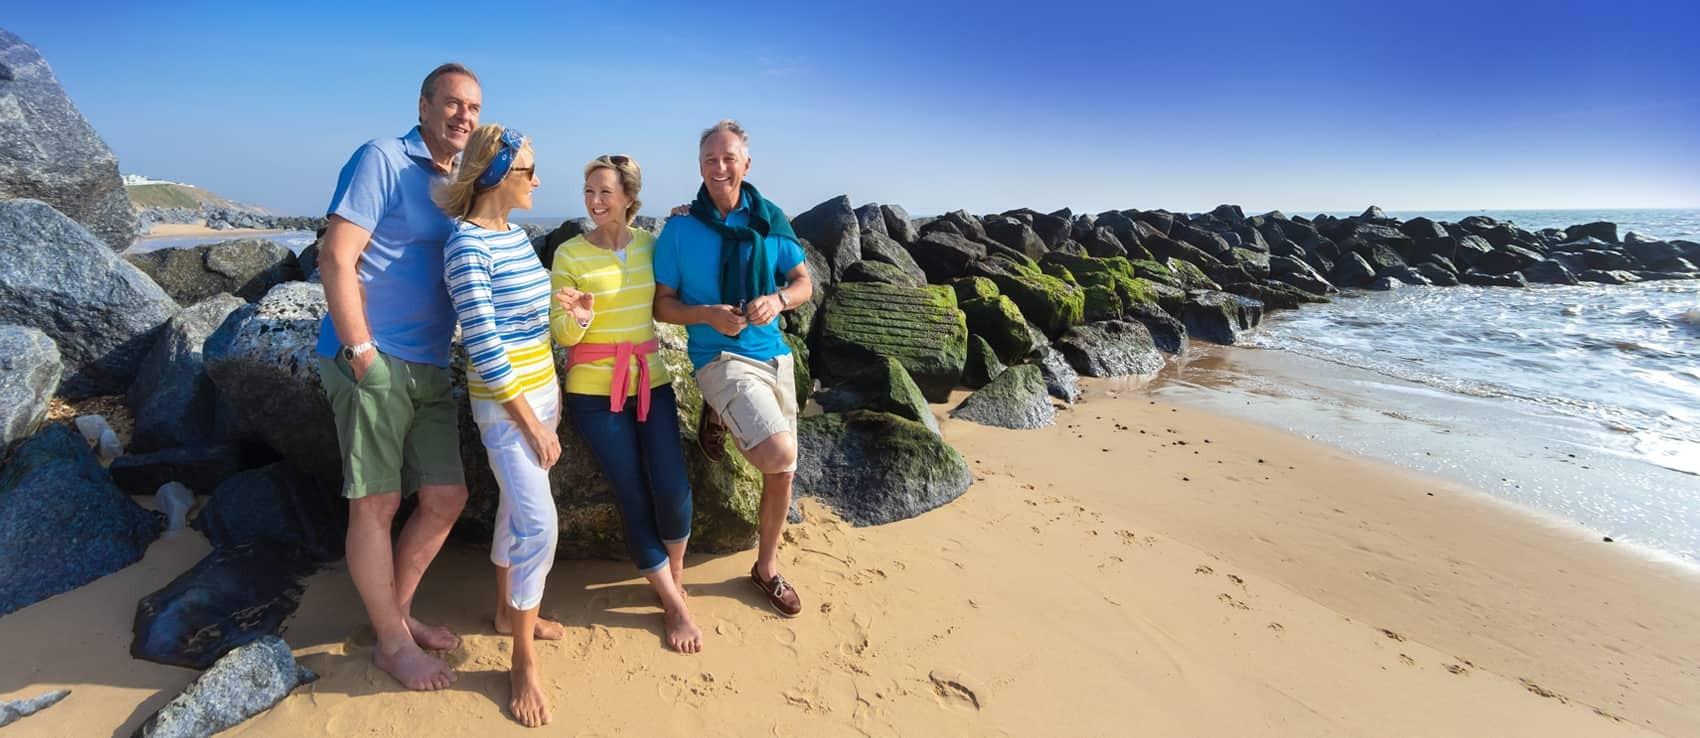 Adult Summer Breaks - Potters Resort